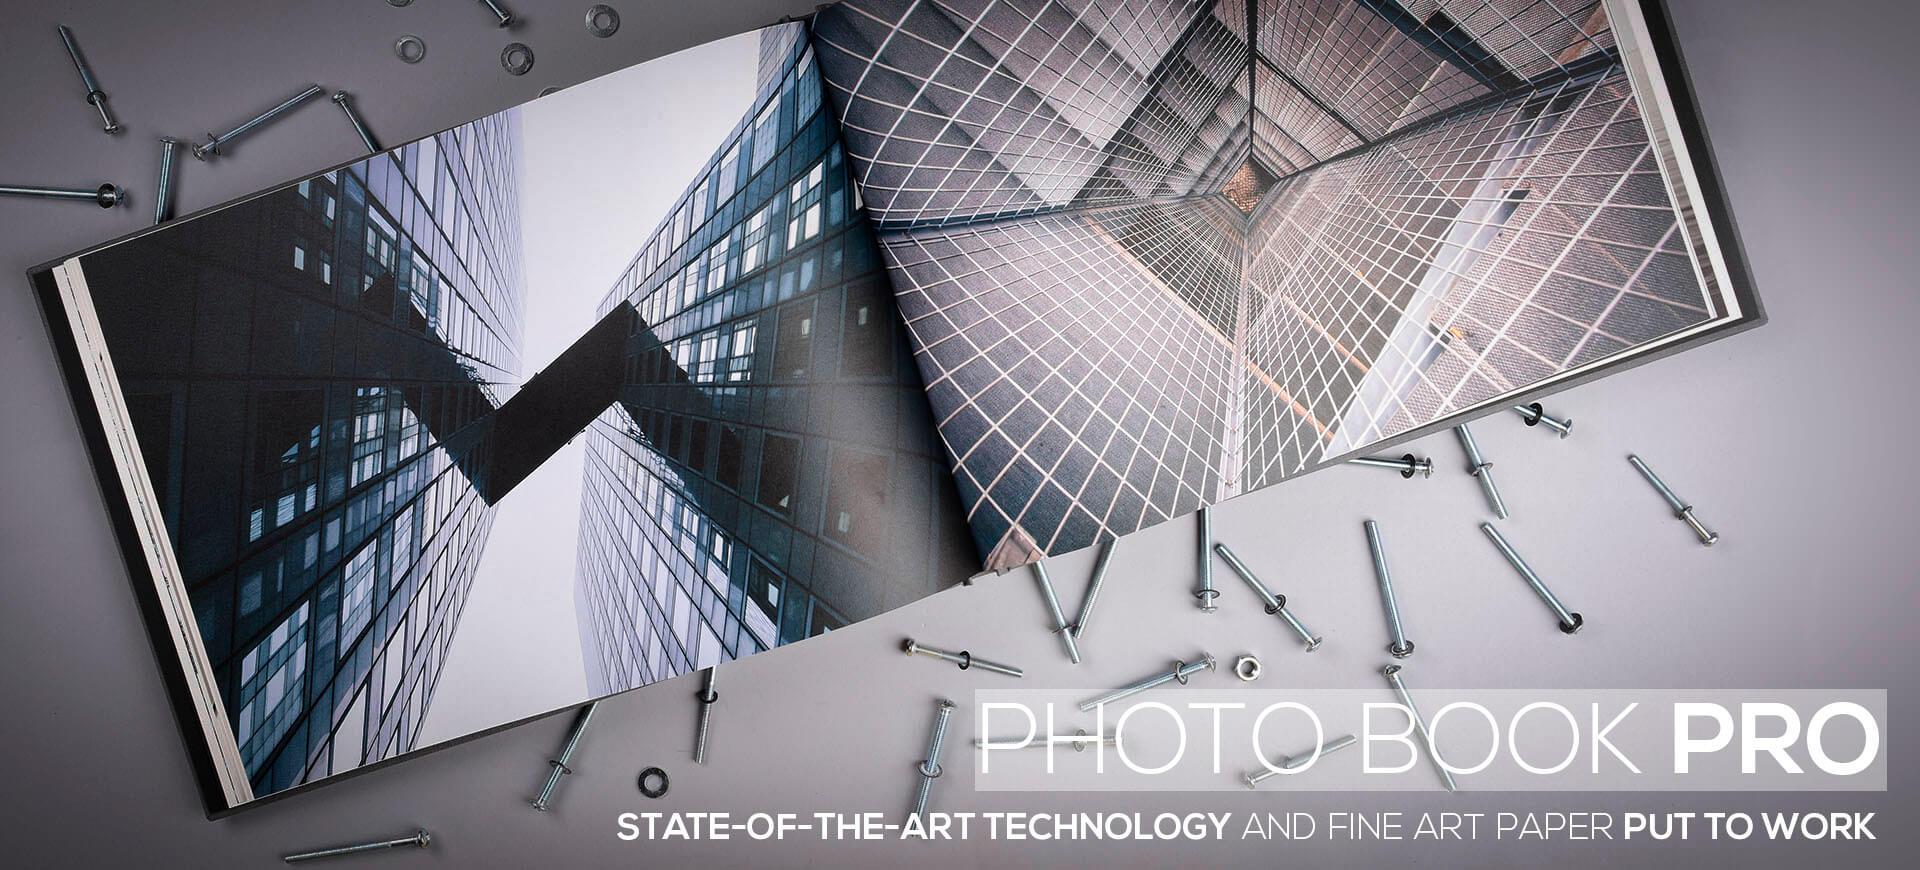 Photo Book Pro